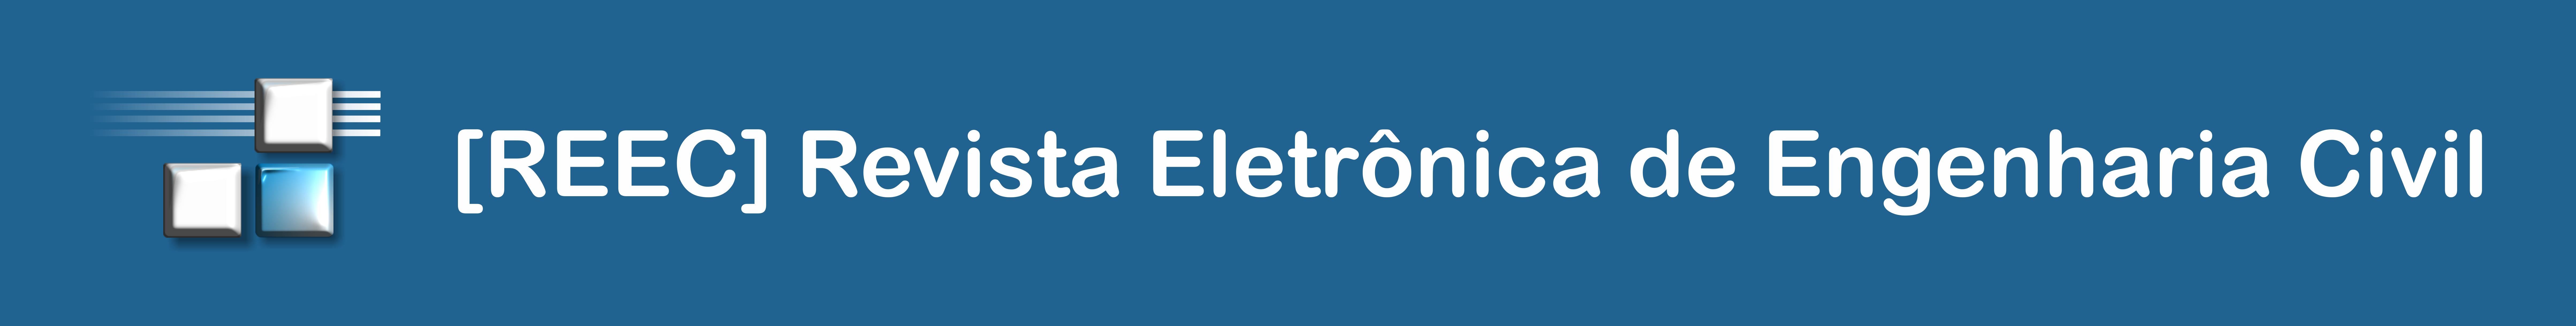 [REEC] Revista Eletrônica de Engenharia Civil